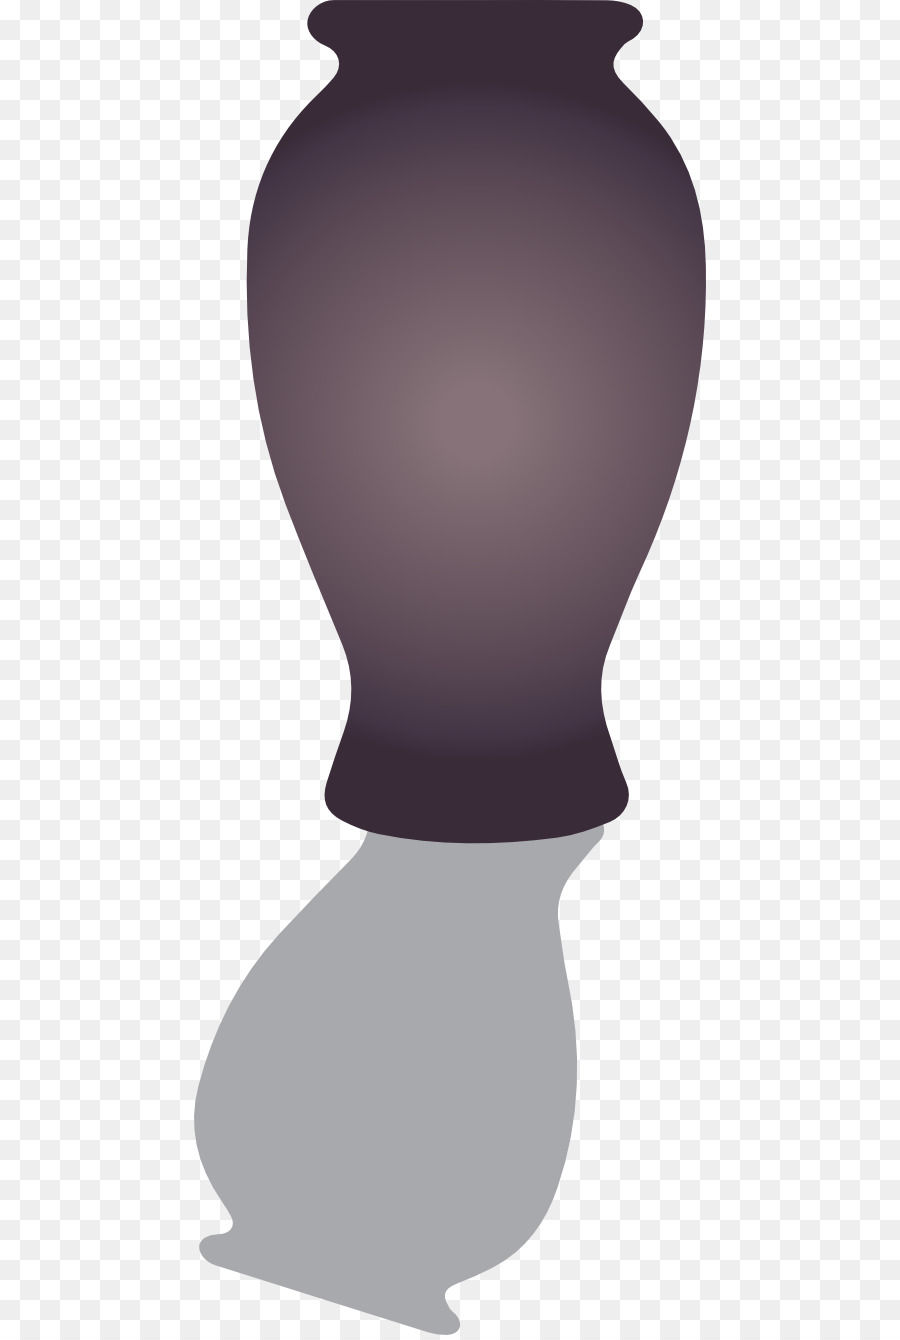 vase royalty free drawing clip art vase vector 512 1335 transprent